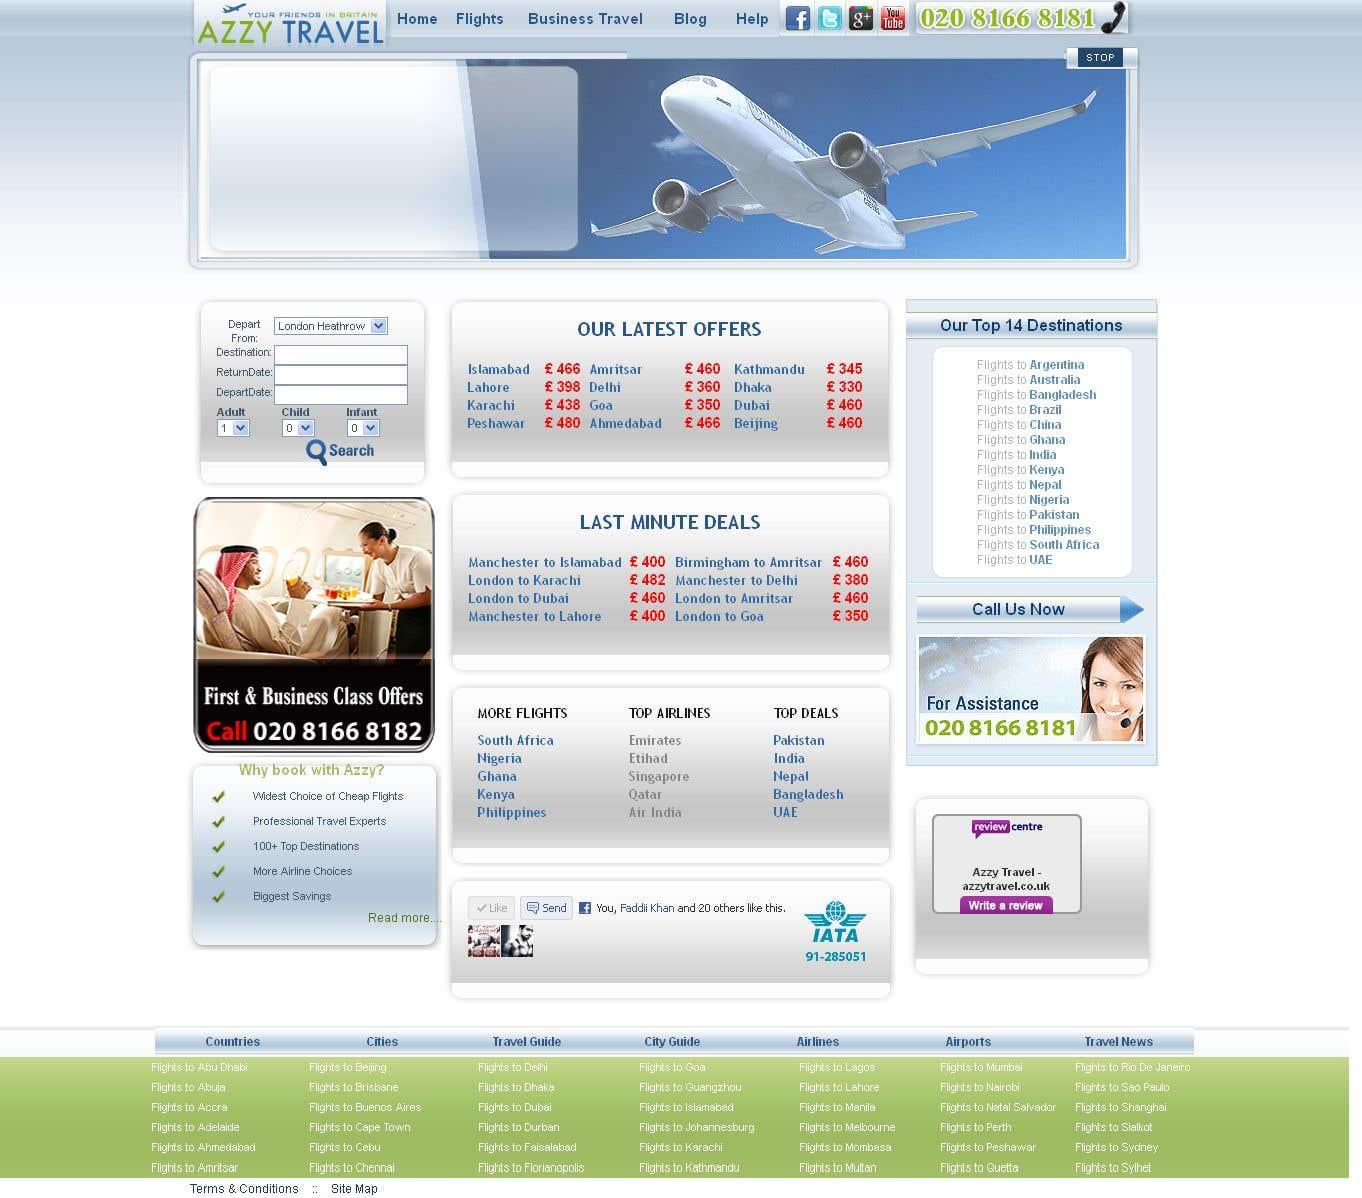 http://azzytravel.co.uk